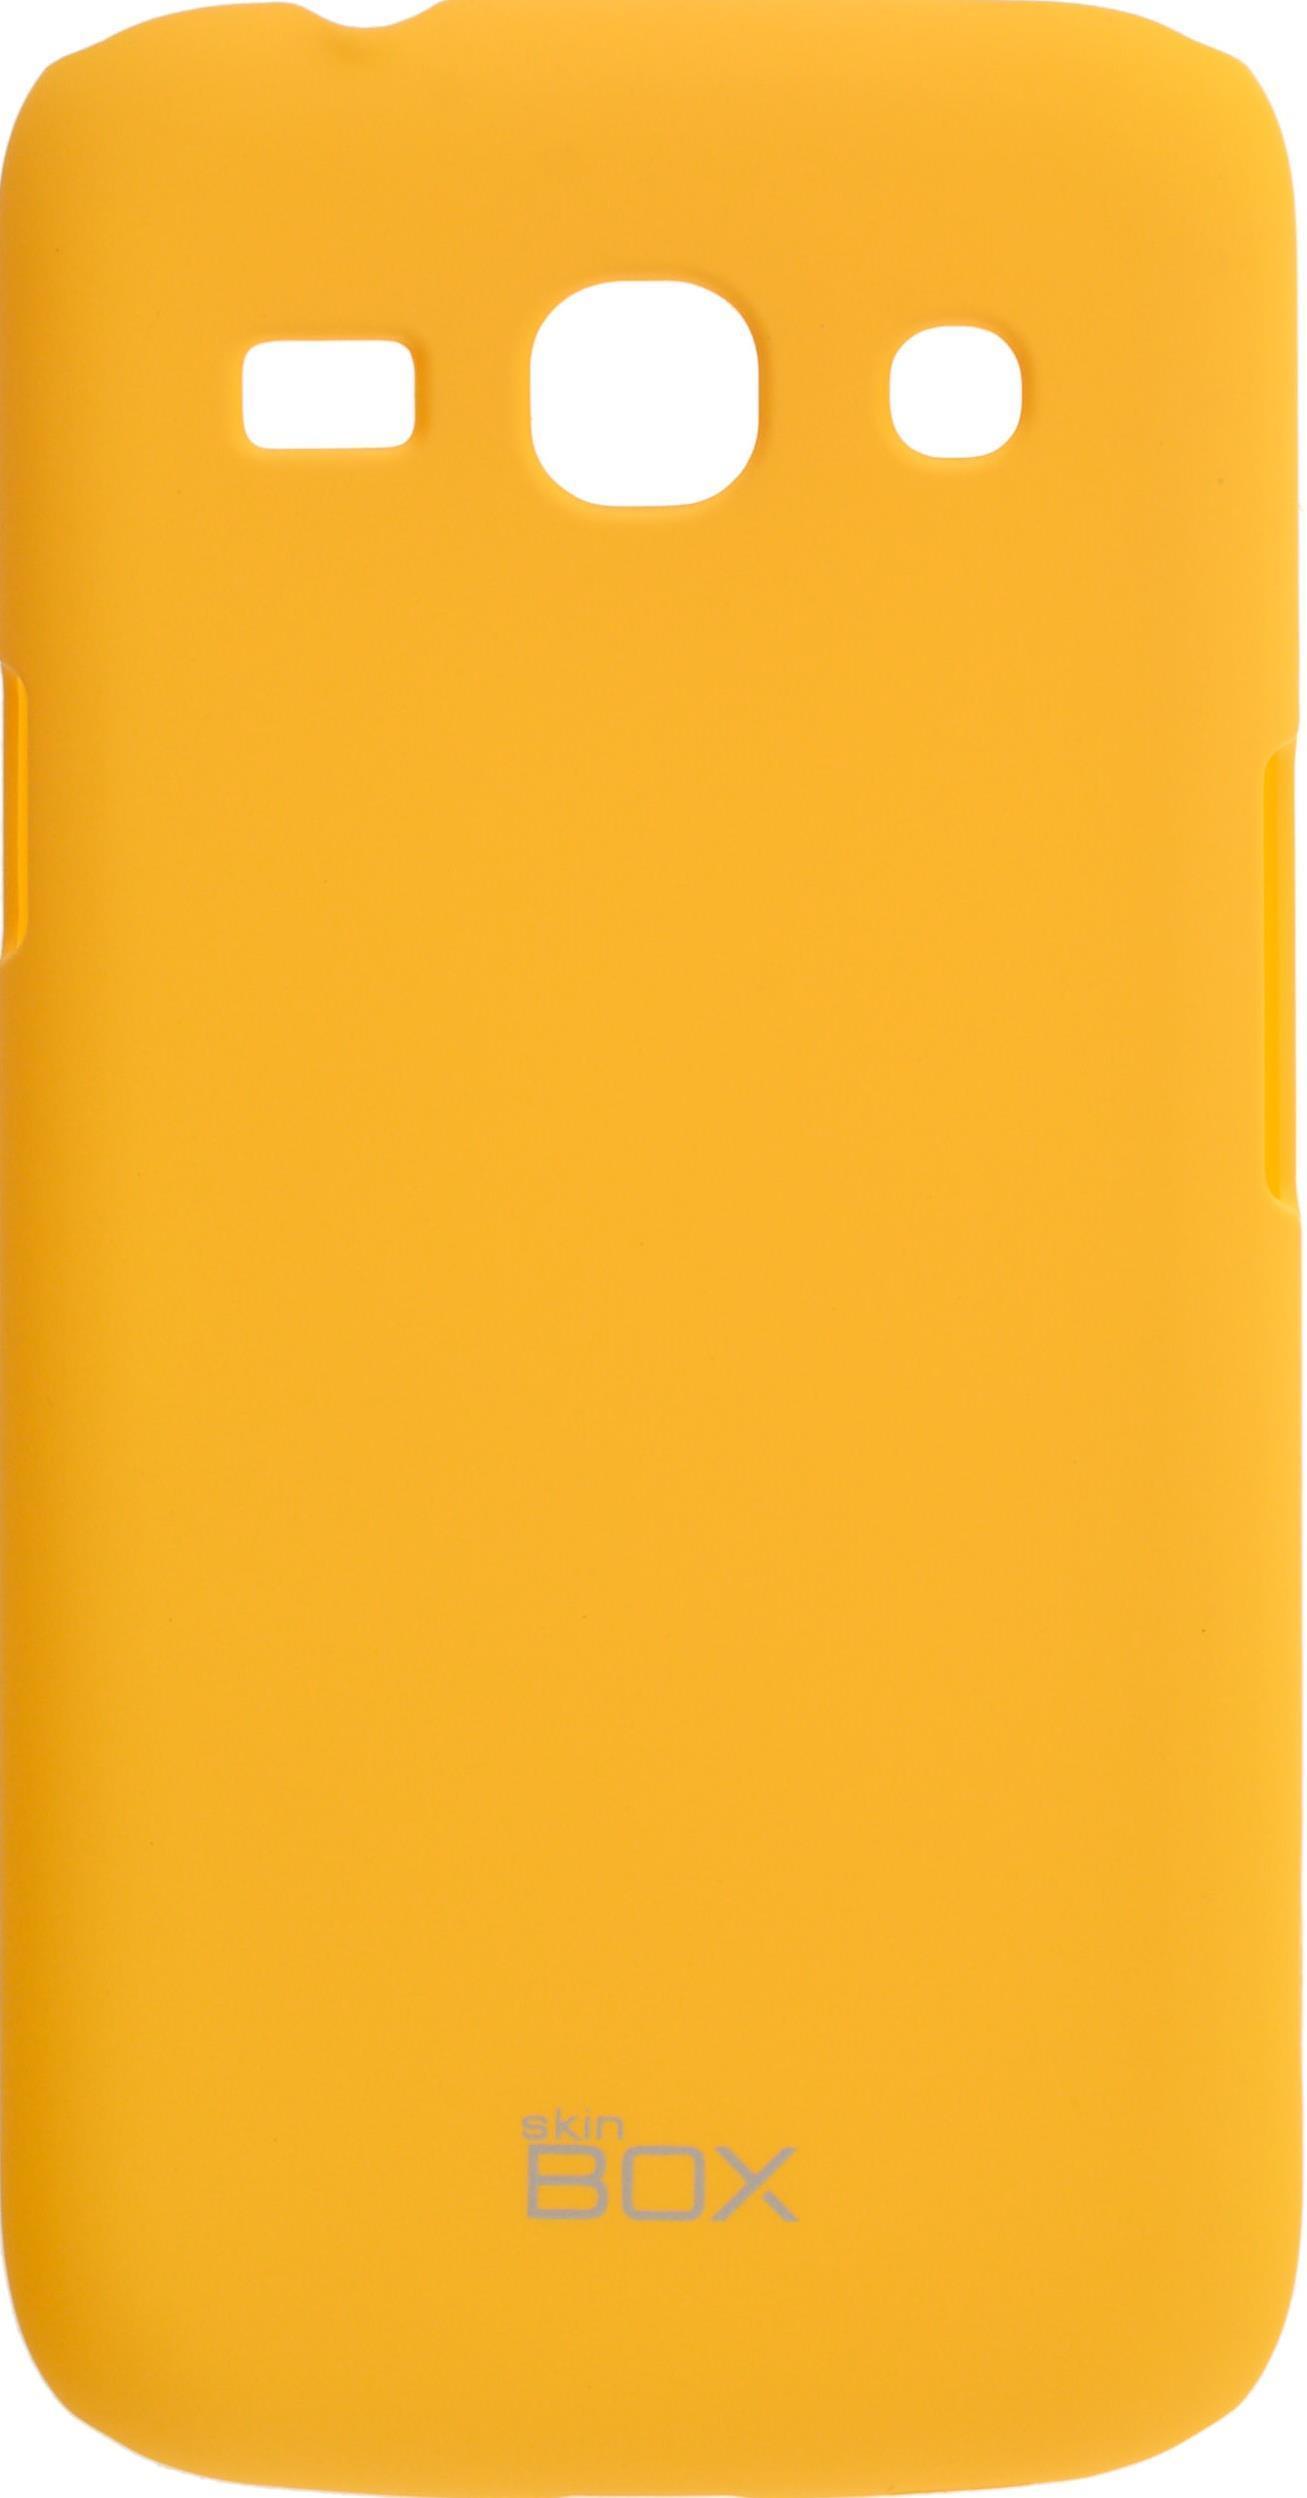 Чехол для сотового телефона skinBOX 4People, 4630042526532, желтый чехол для сотового телефона skinbox 4people 4630042526730 желтый